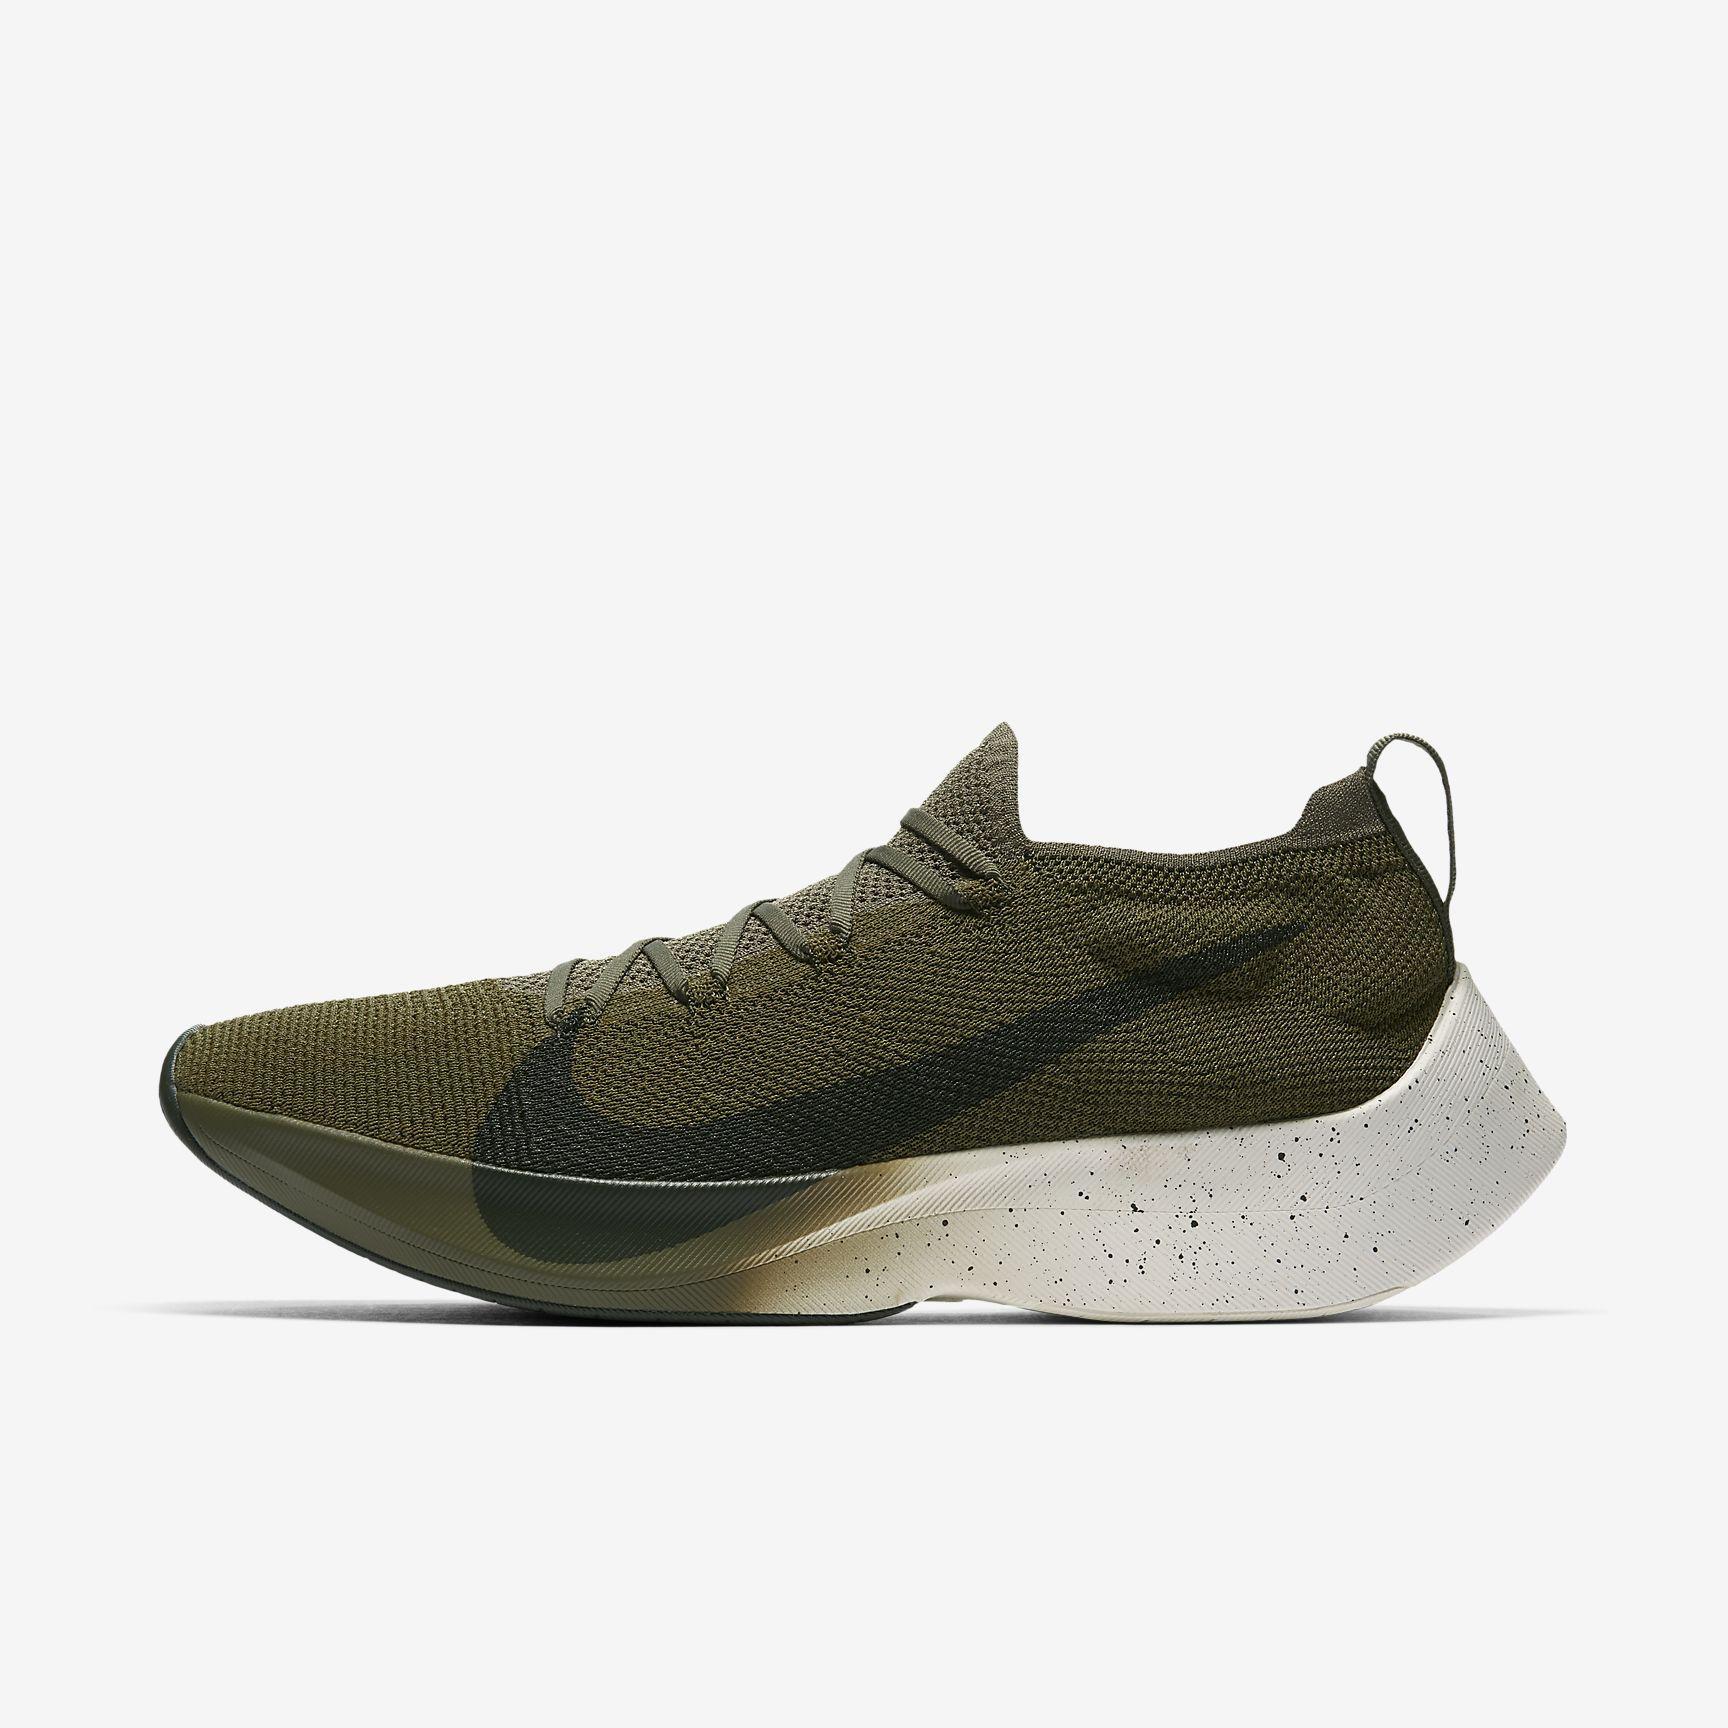 quality design 9a2ce 870ce React Vapor Street Flyknit – sko til mænd | wishlist | Sneakers nike ...